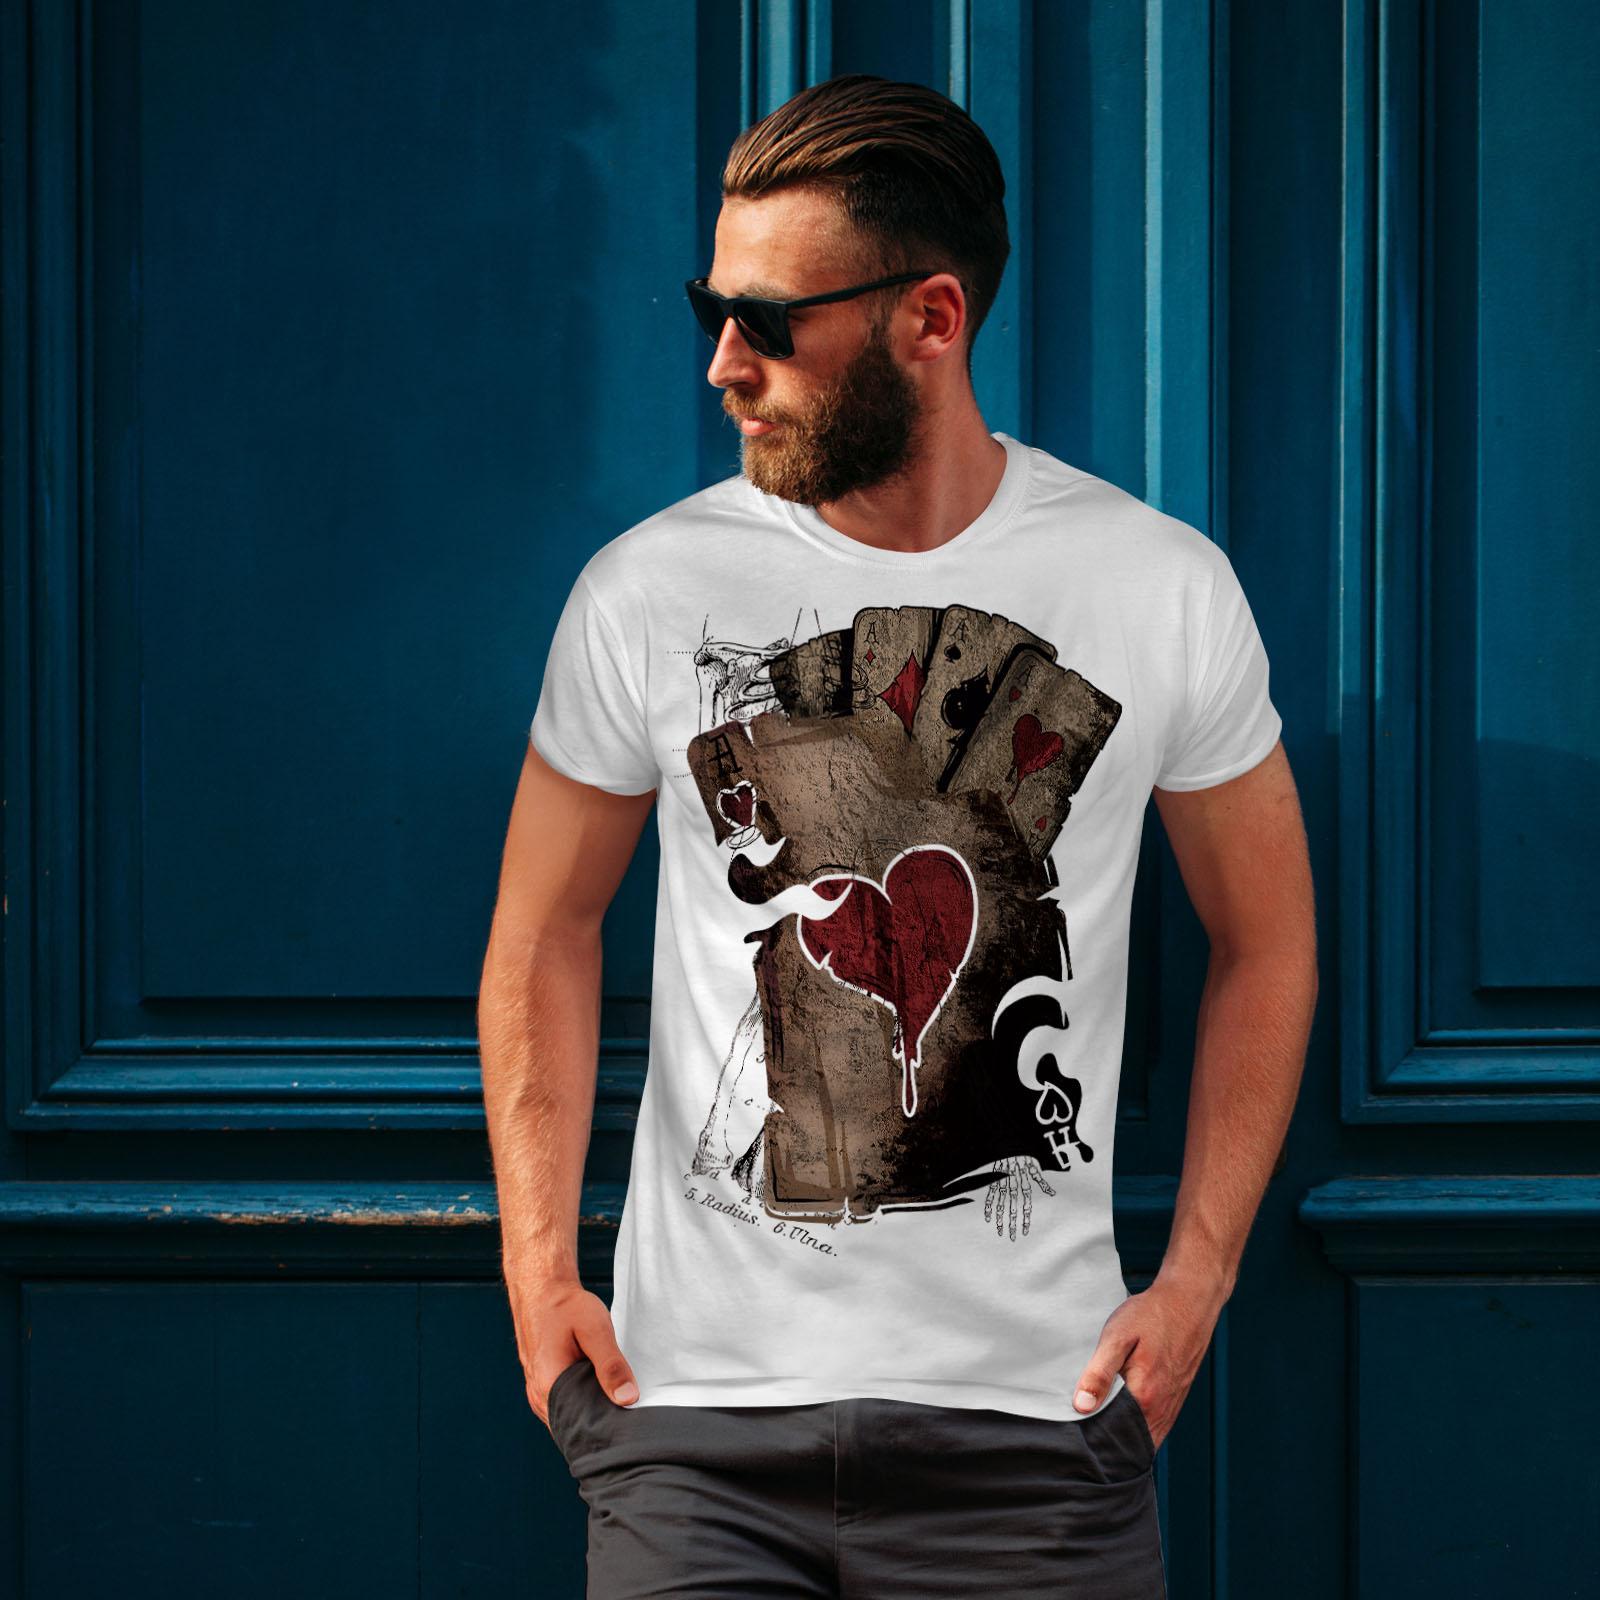 Wellcoda-Poker-Gamble-Squelette-T-shirt-homme-effrayant-conception-graphique-imprime-Tee miniature 10